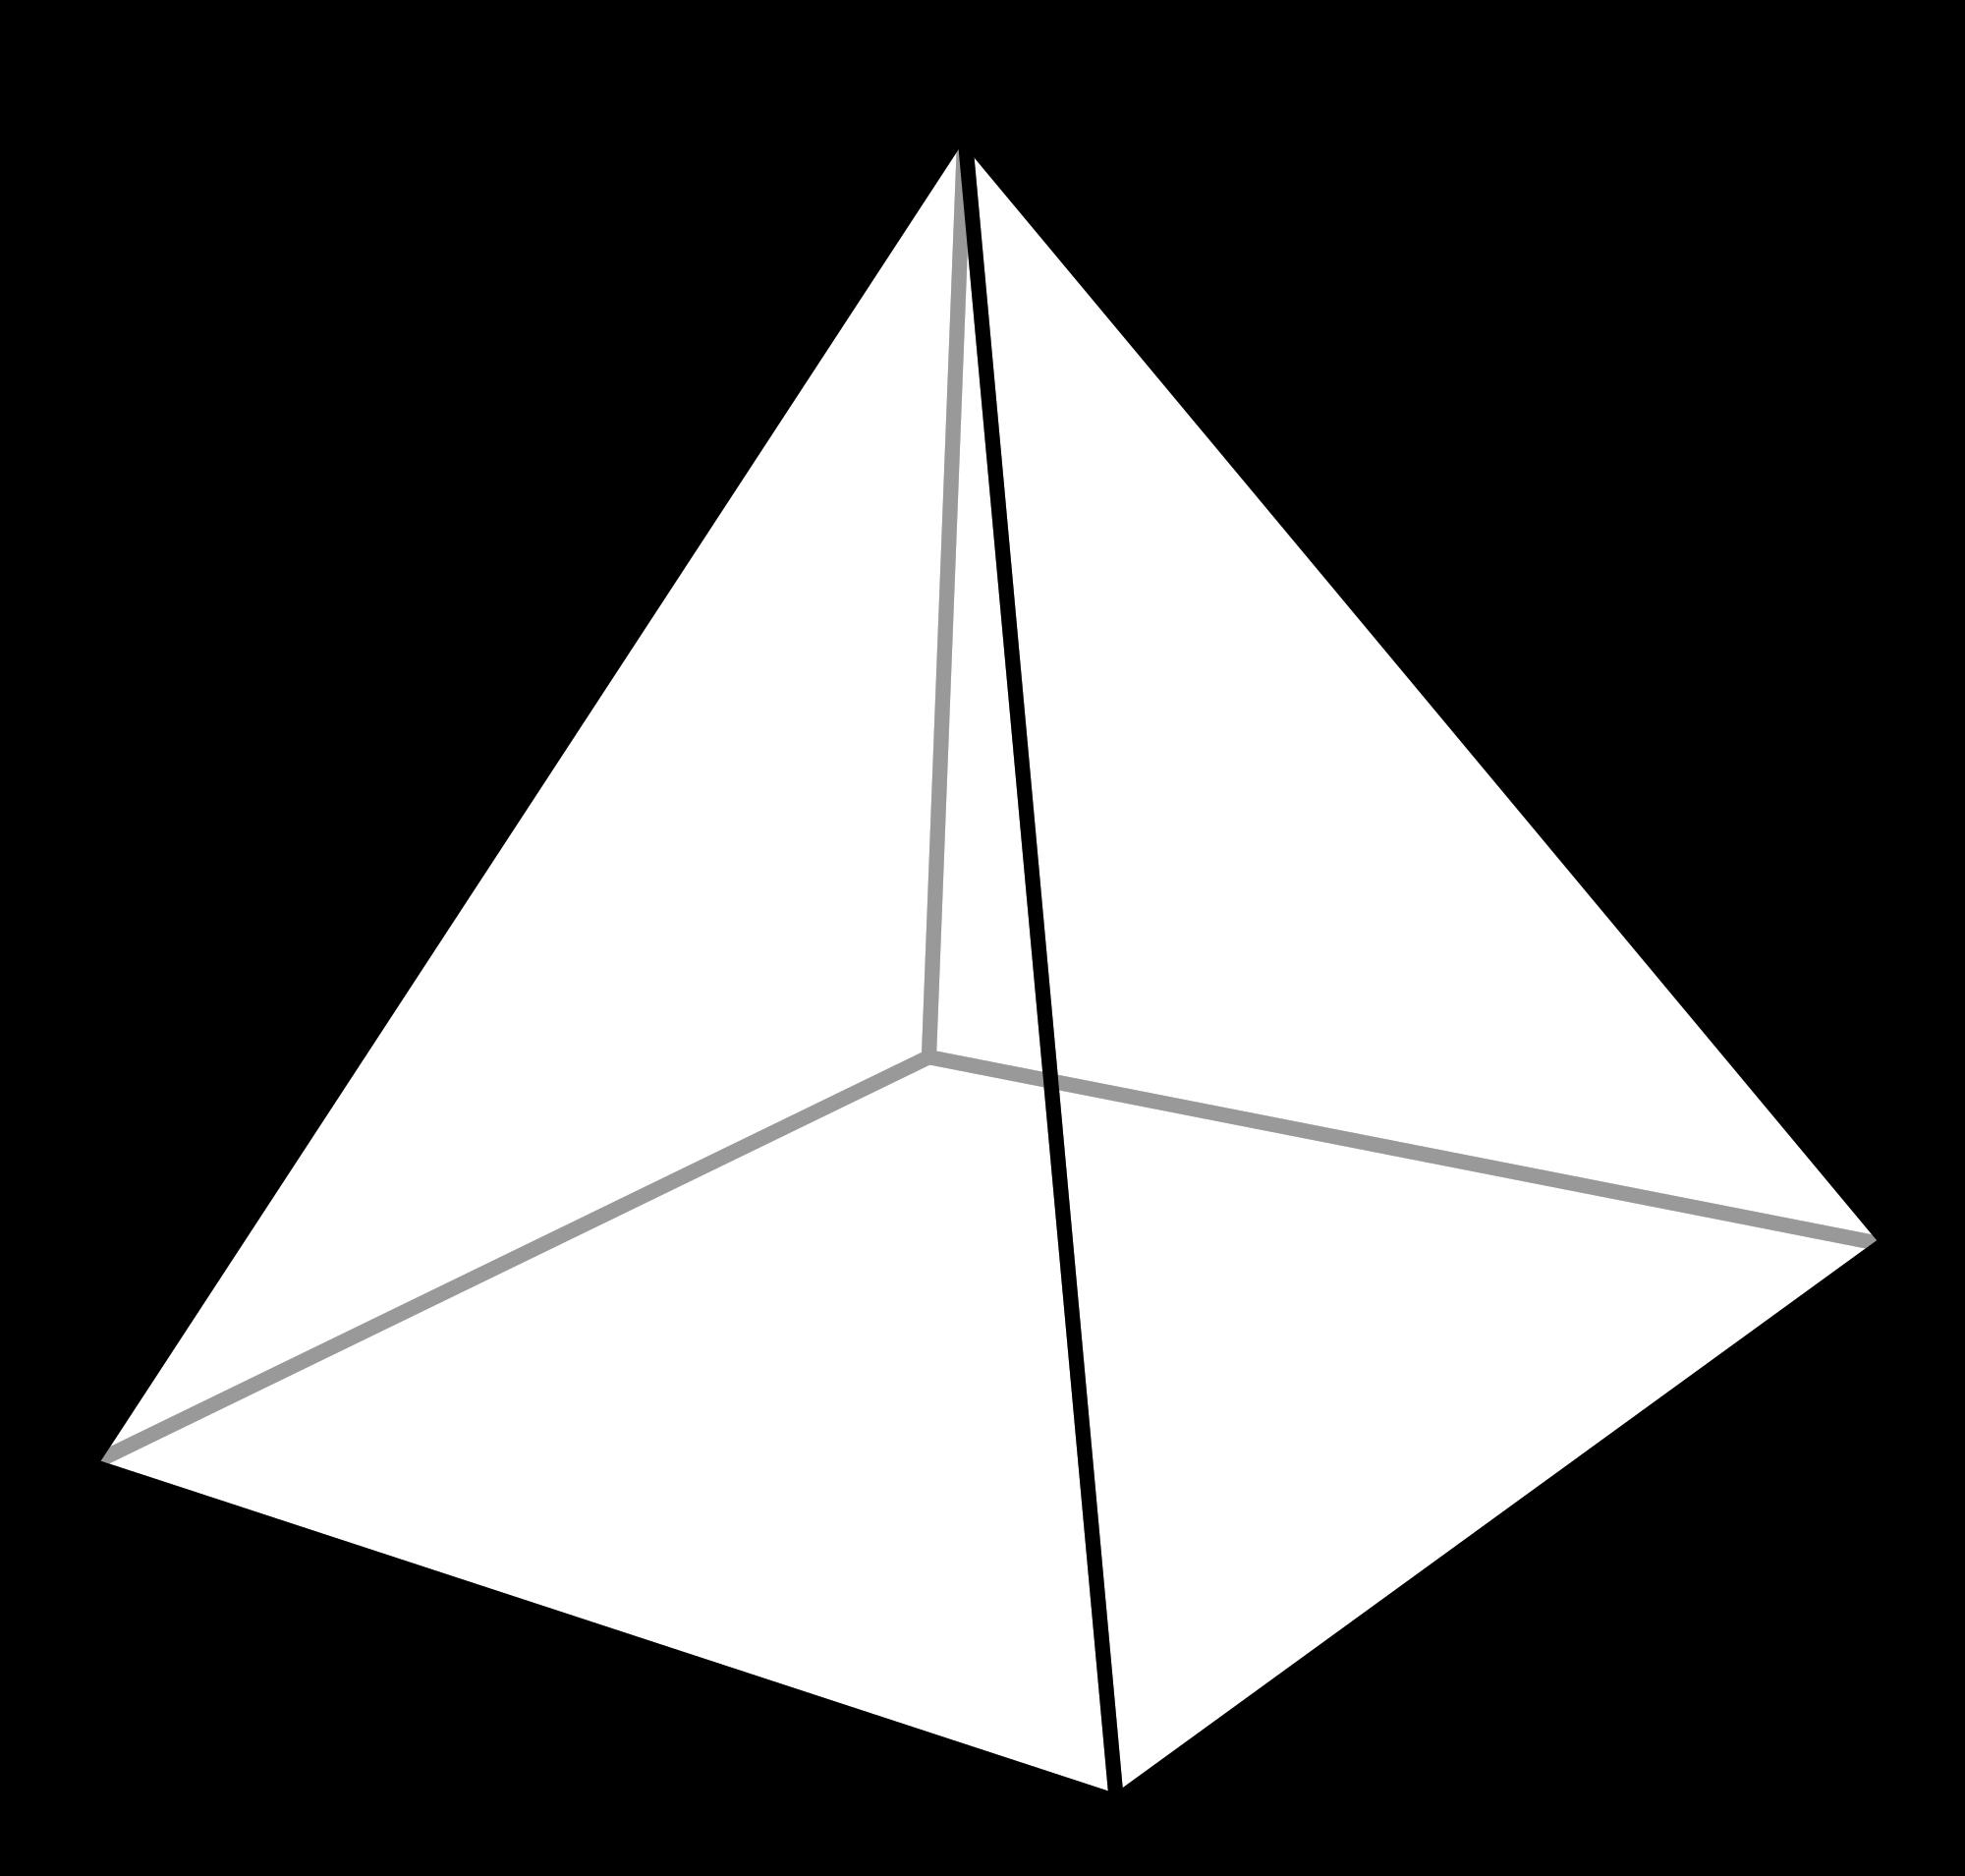 banner royalty free Strikingly idea pyramid of. Pyramids clipart